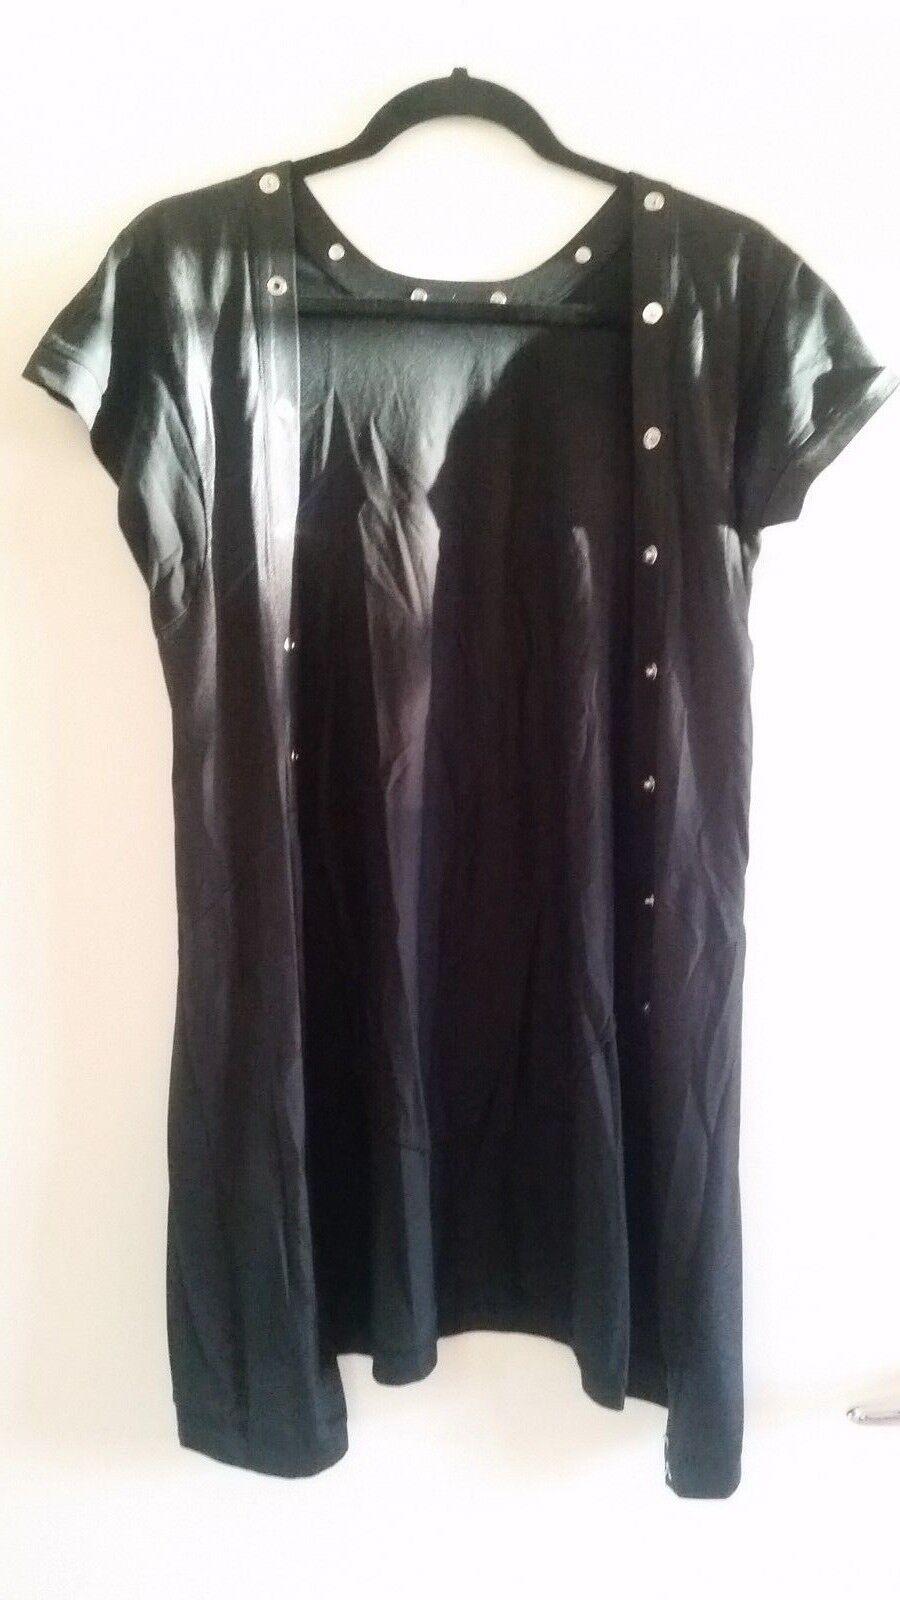 BOSS Orange HUGO BOSS Damen Designer Blause LongBlause Kleid Hemd 34 XS S Schwarz